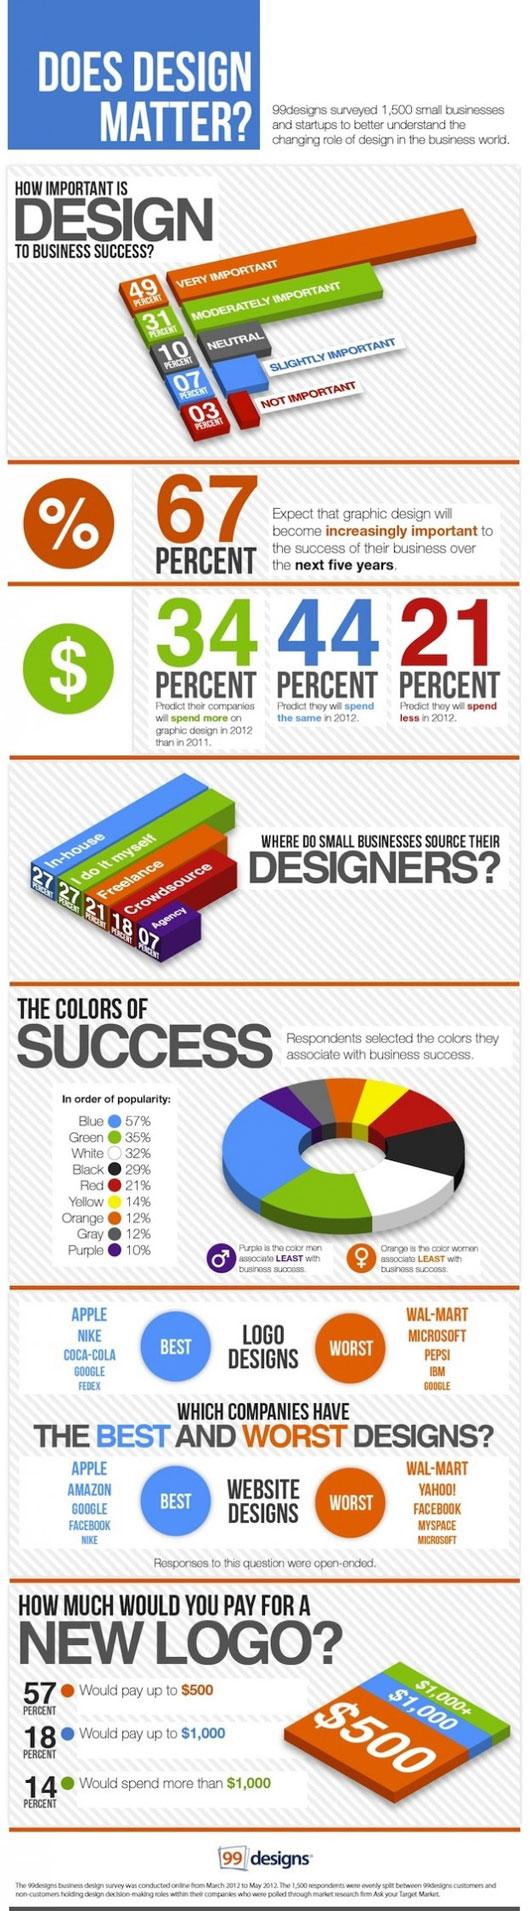 Design Matter Infographic